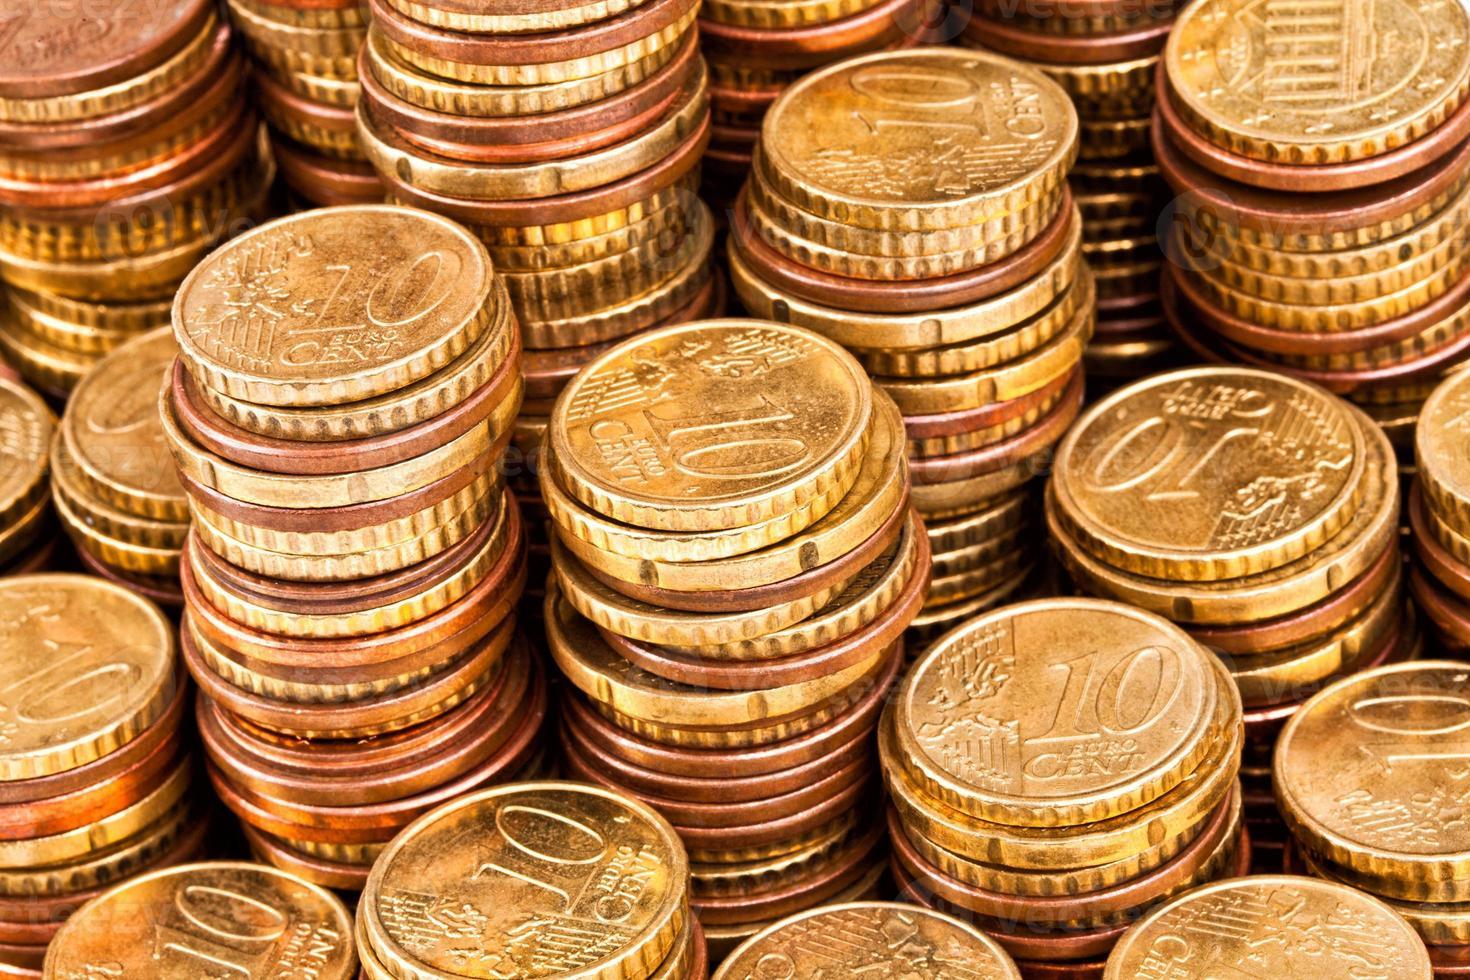 moneta d'oro foto